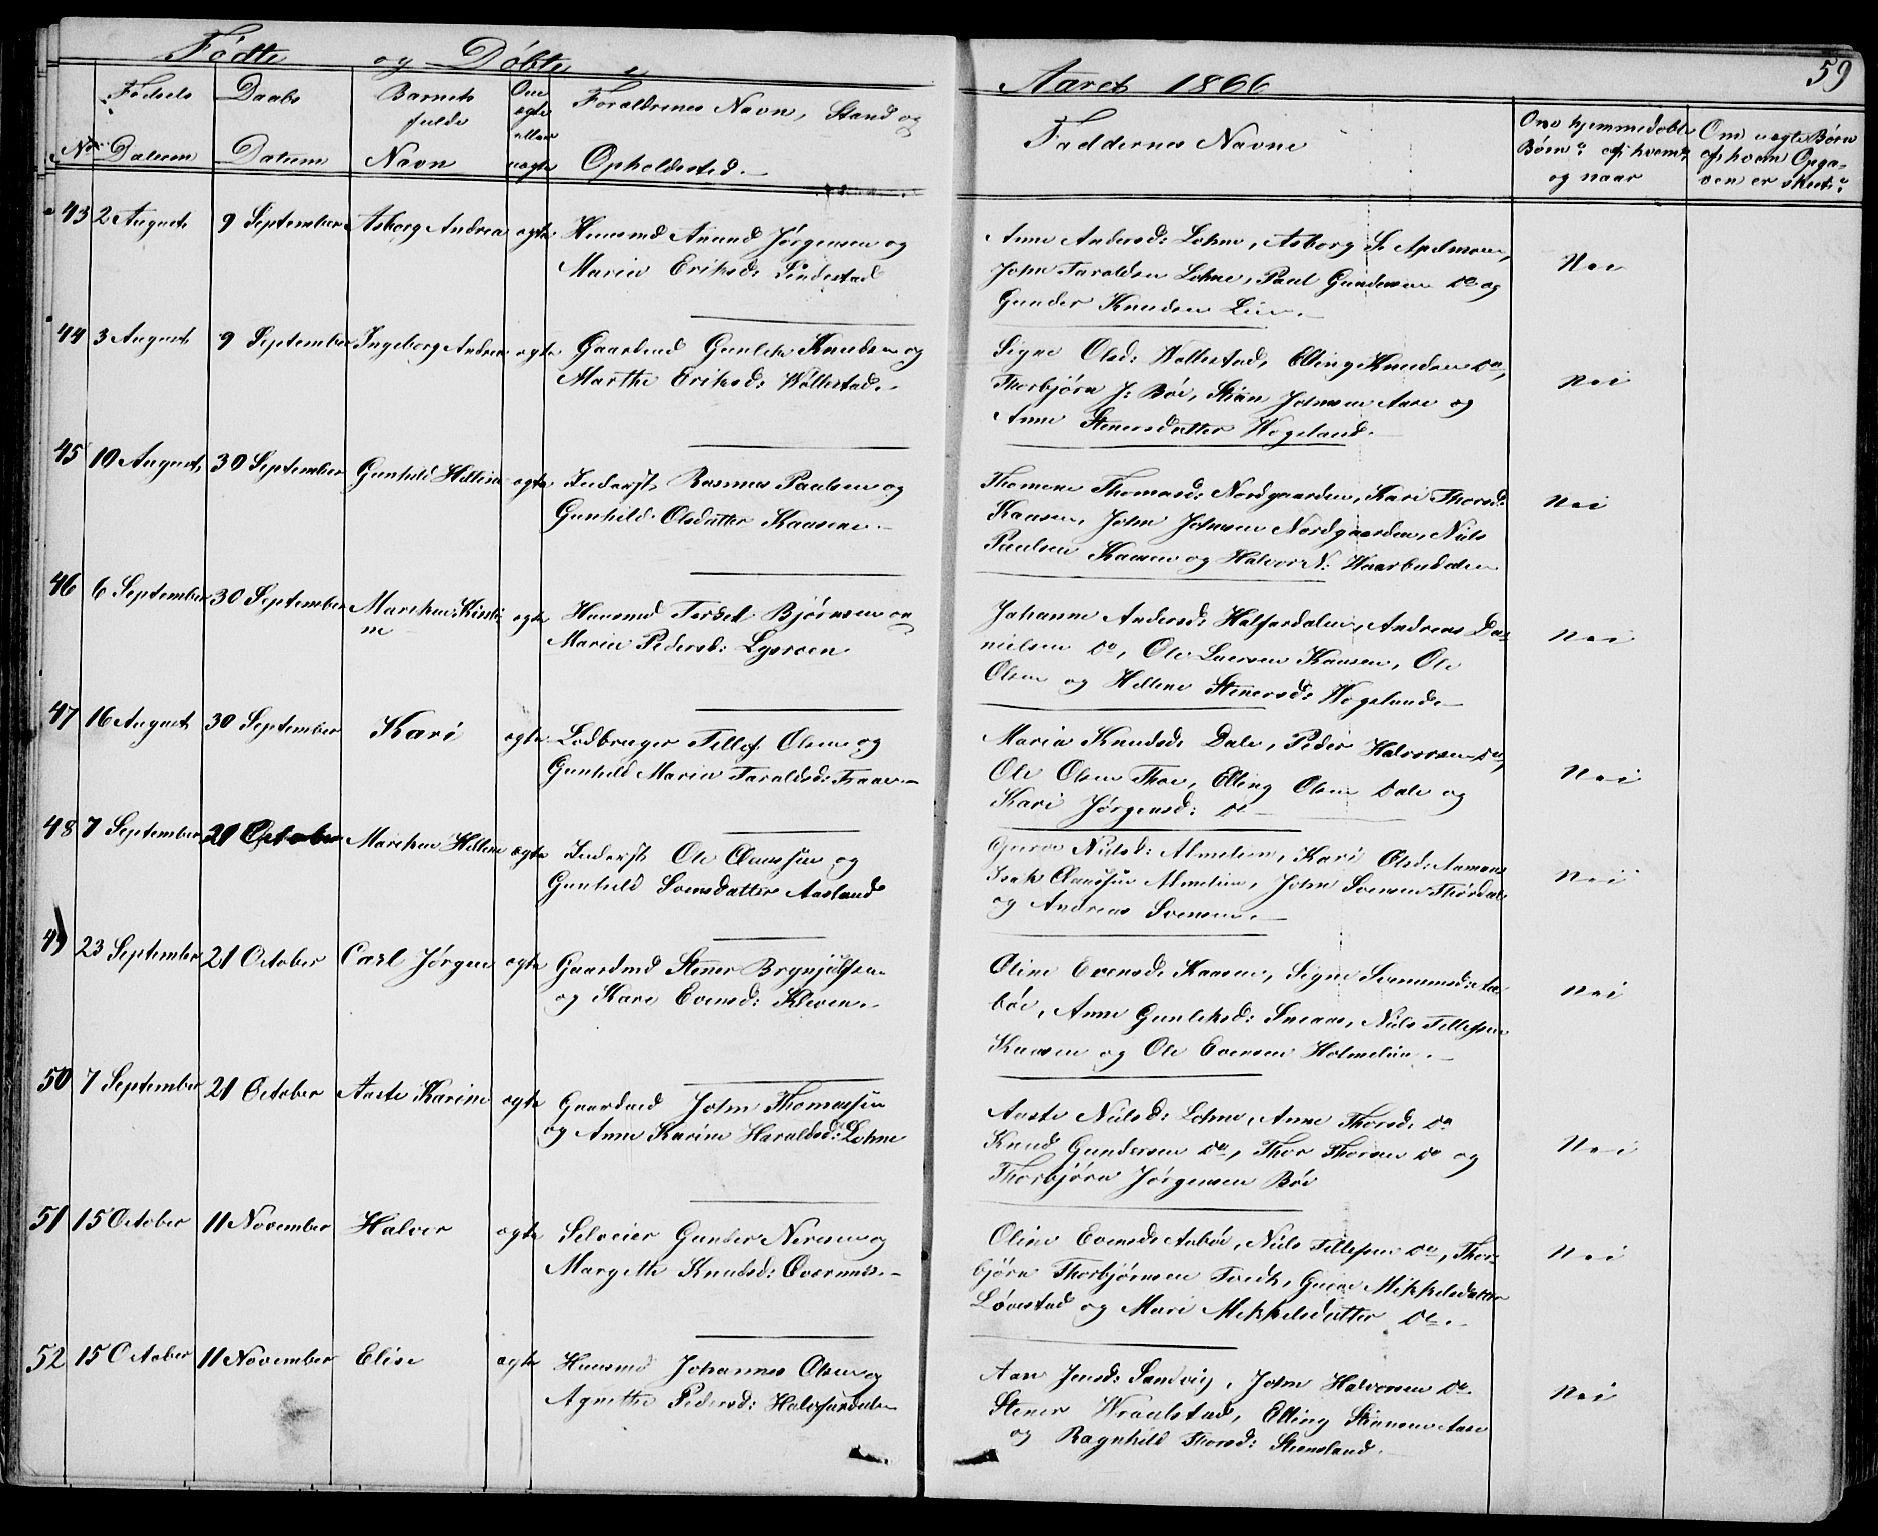 SAKO, Drangedal kirkebøker, G/Gb/L0001: Klokkerbok nr. II 1, 1856-1894, s. 59